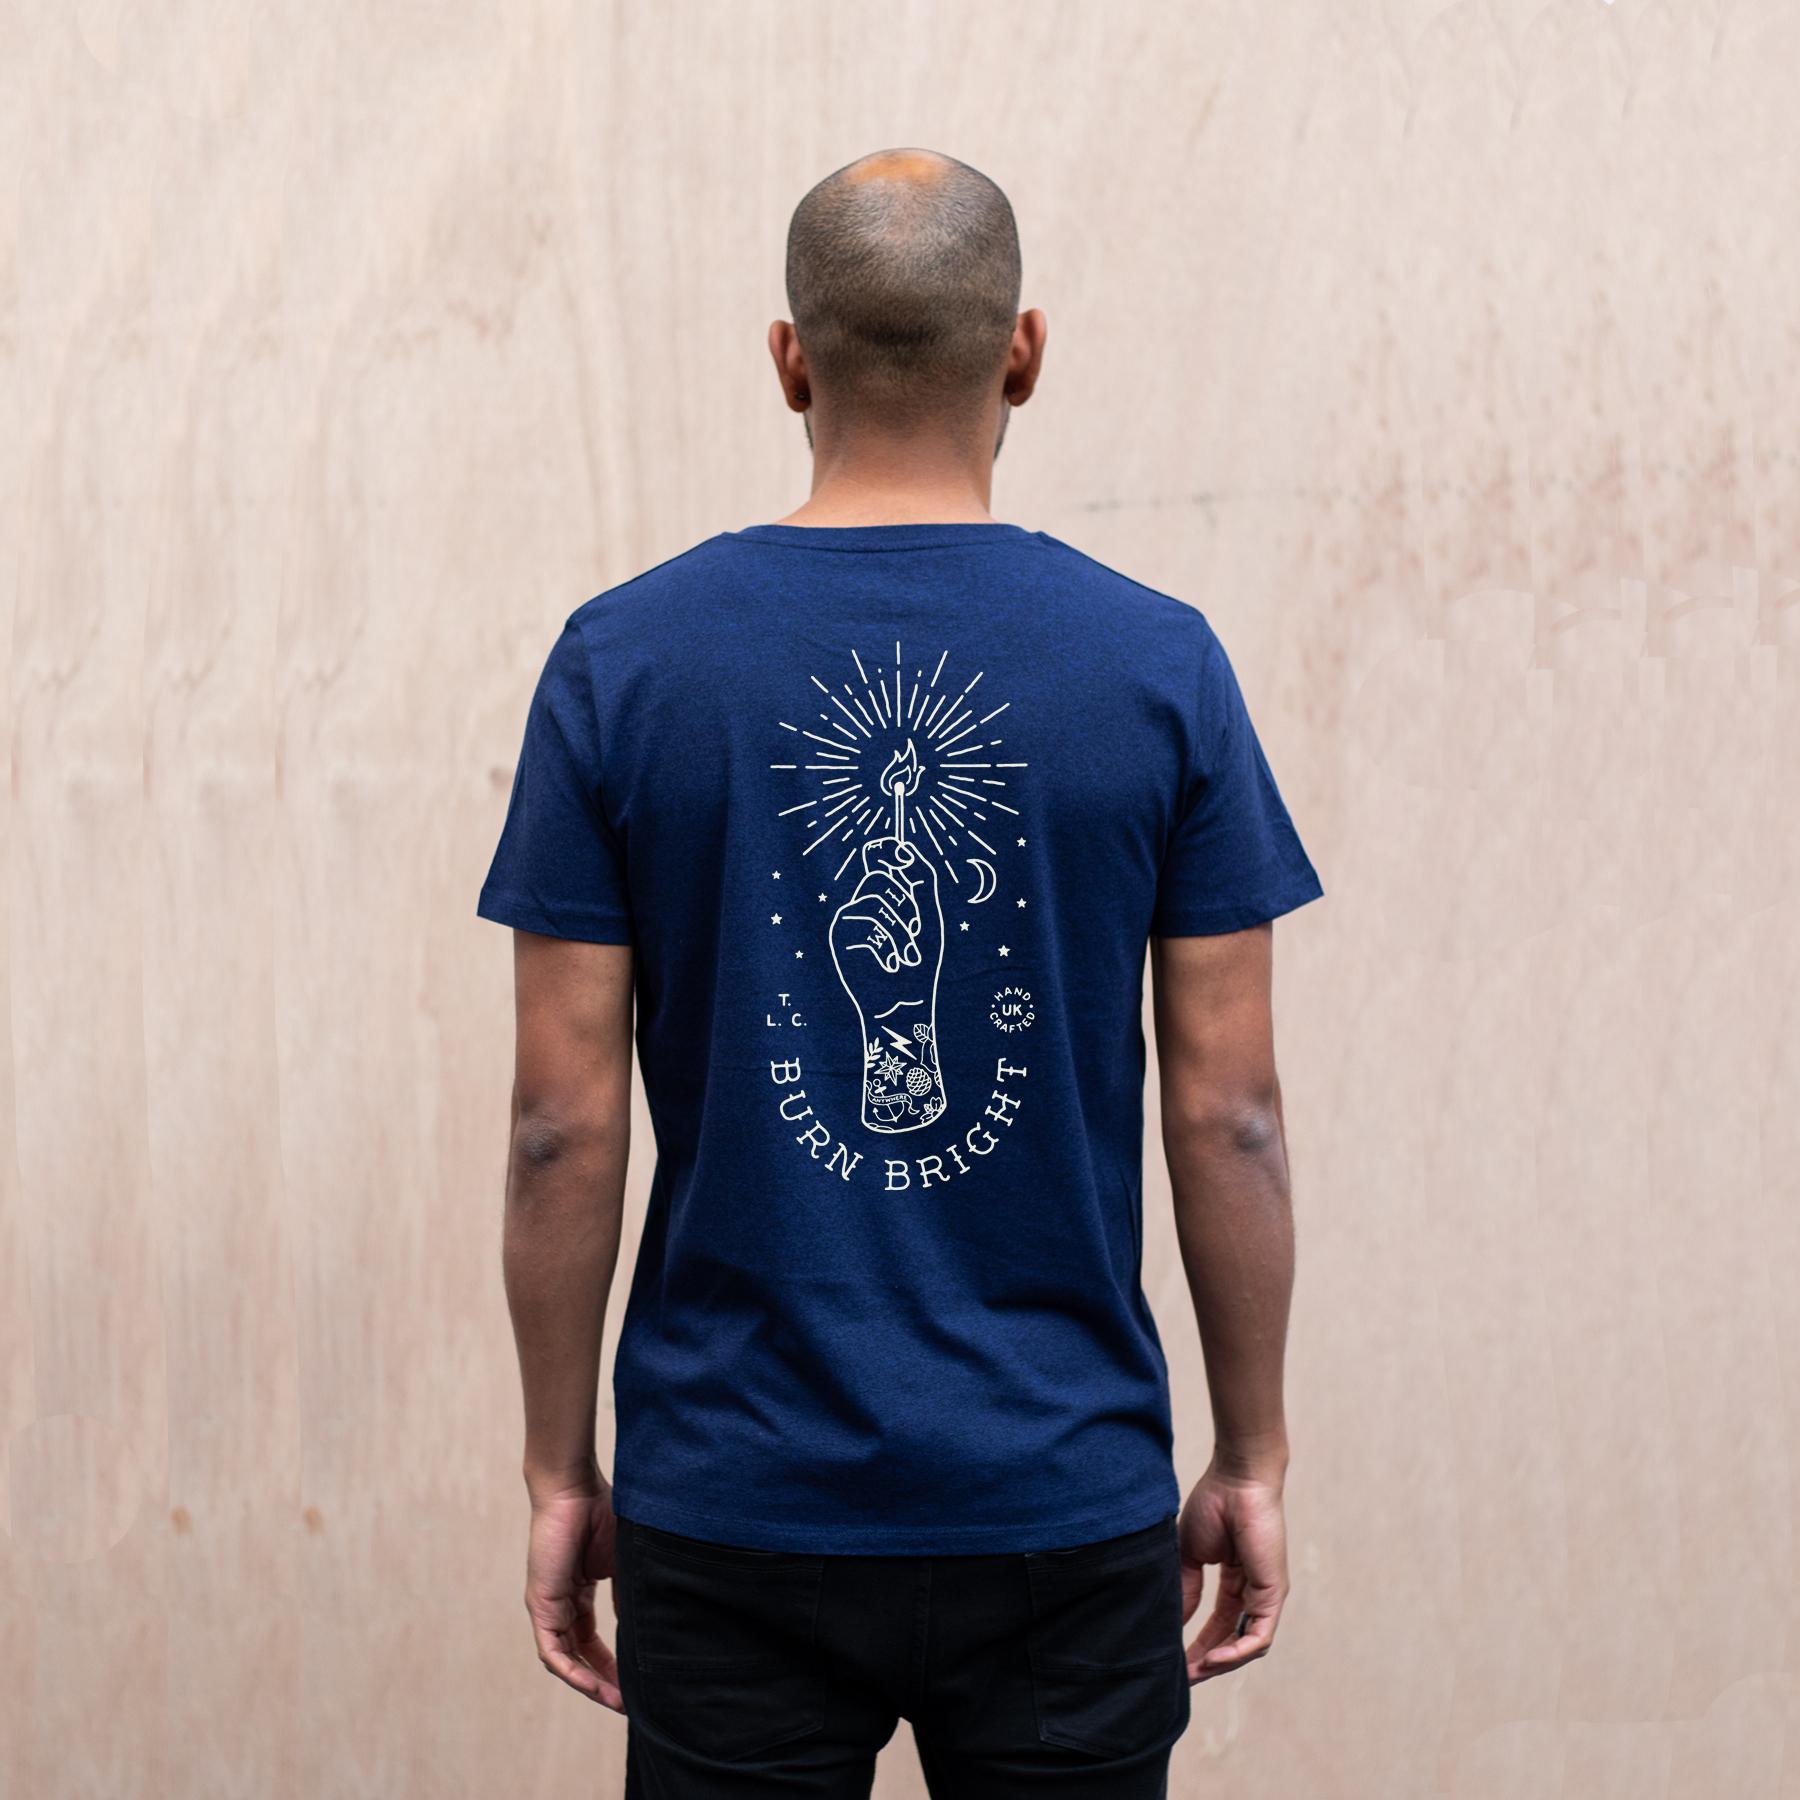 Burn-Bright-organic-t-shirt-mens-back-The-level-Collective.jpg